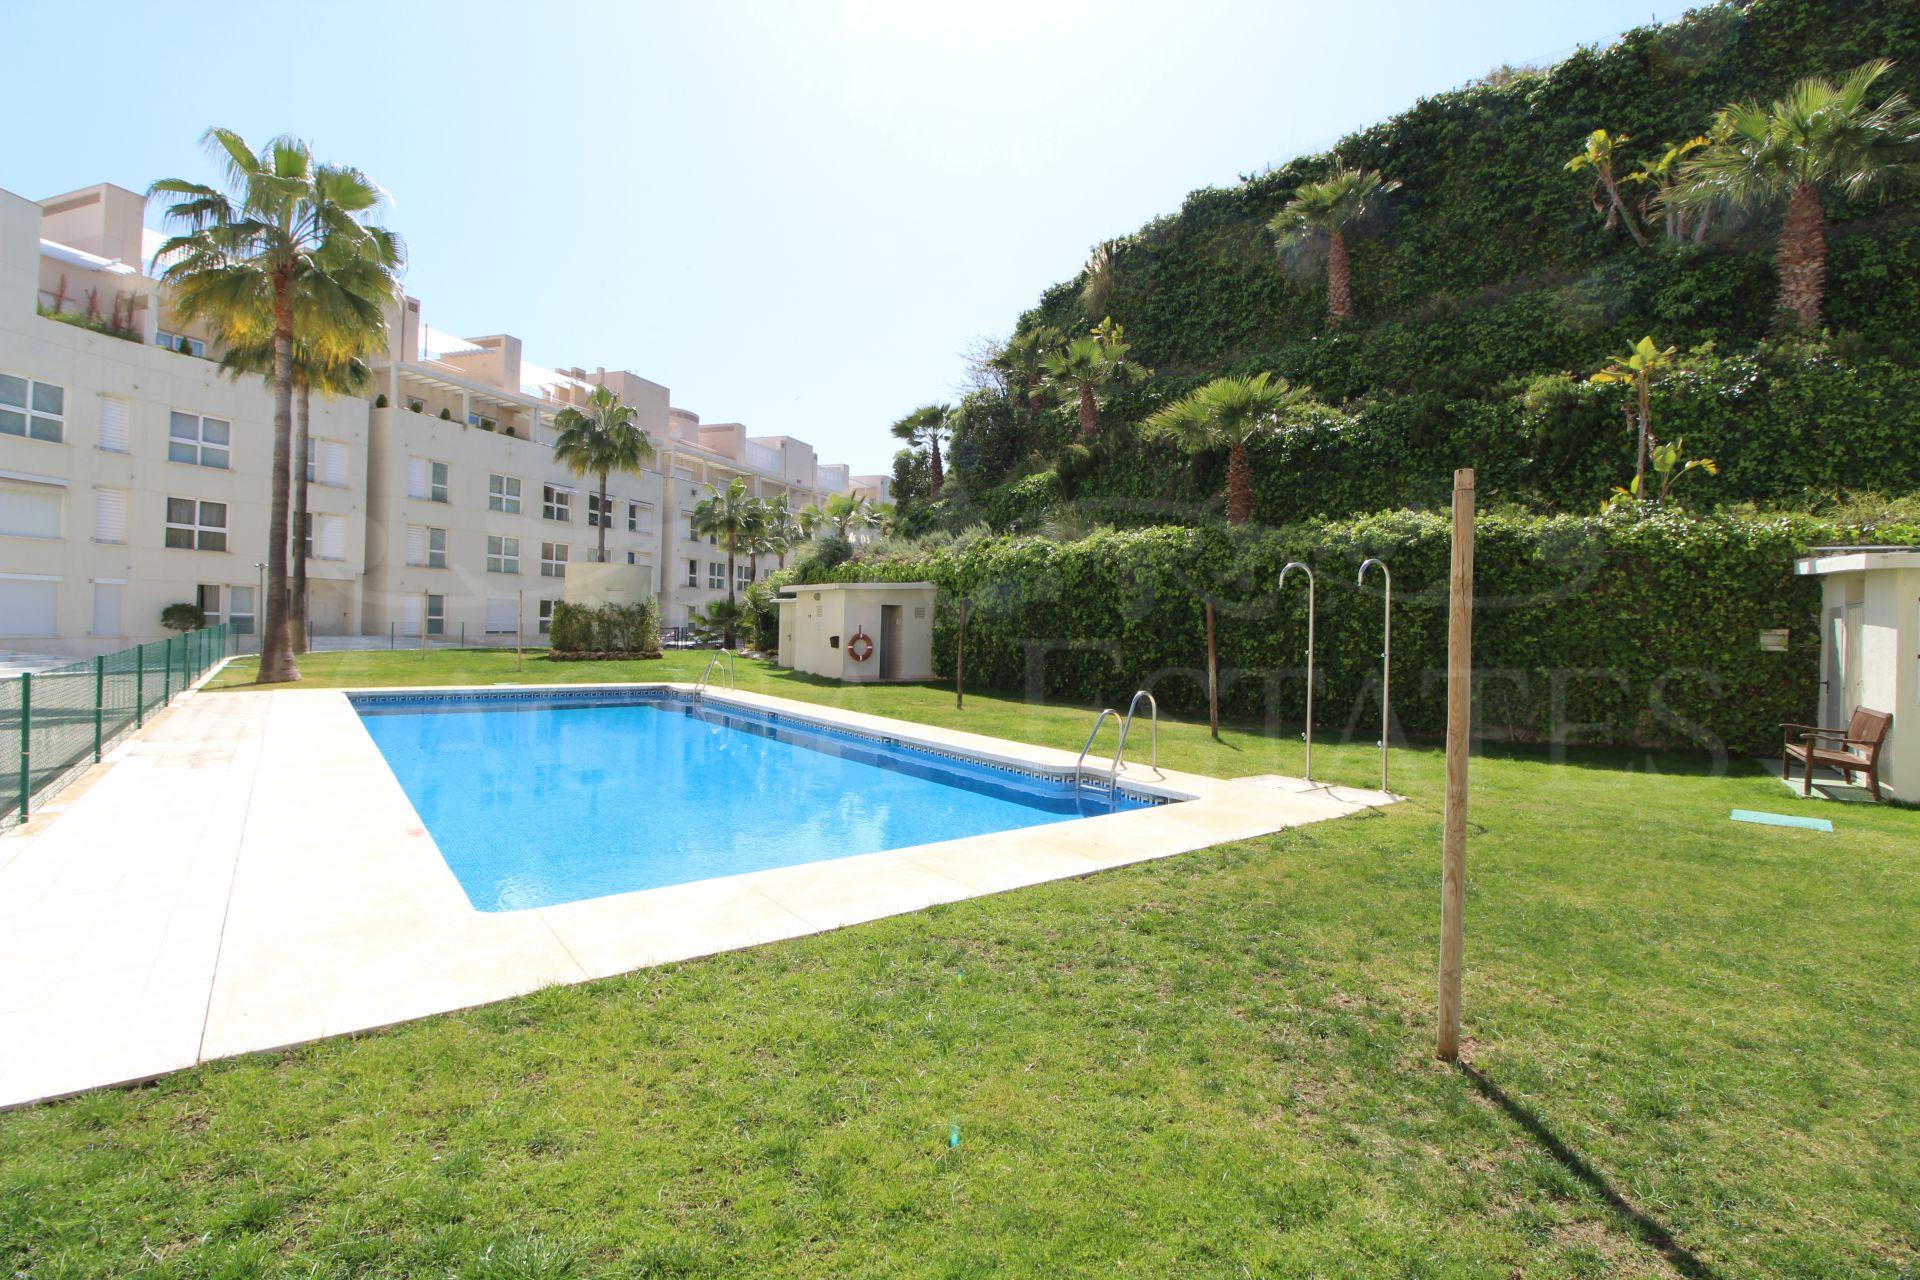 3 bedroom apartment with panoramic views of Las Brisas Golf, La Concha mountain and the sea in Nueva Andalucia, Marbella.